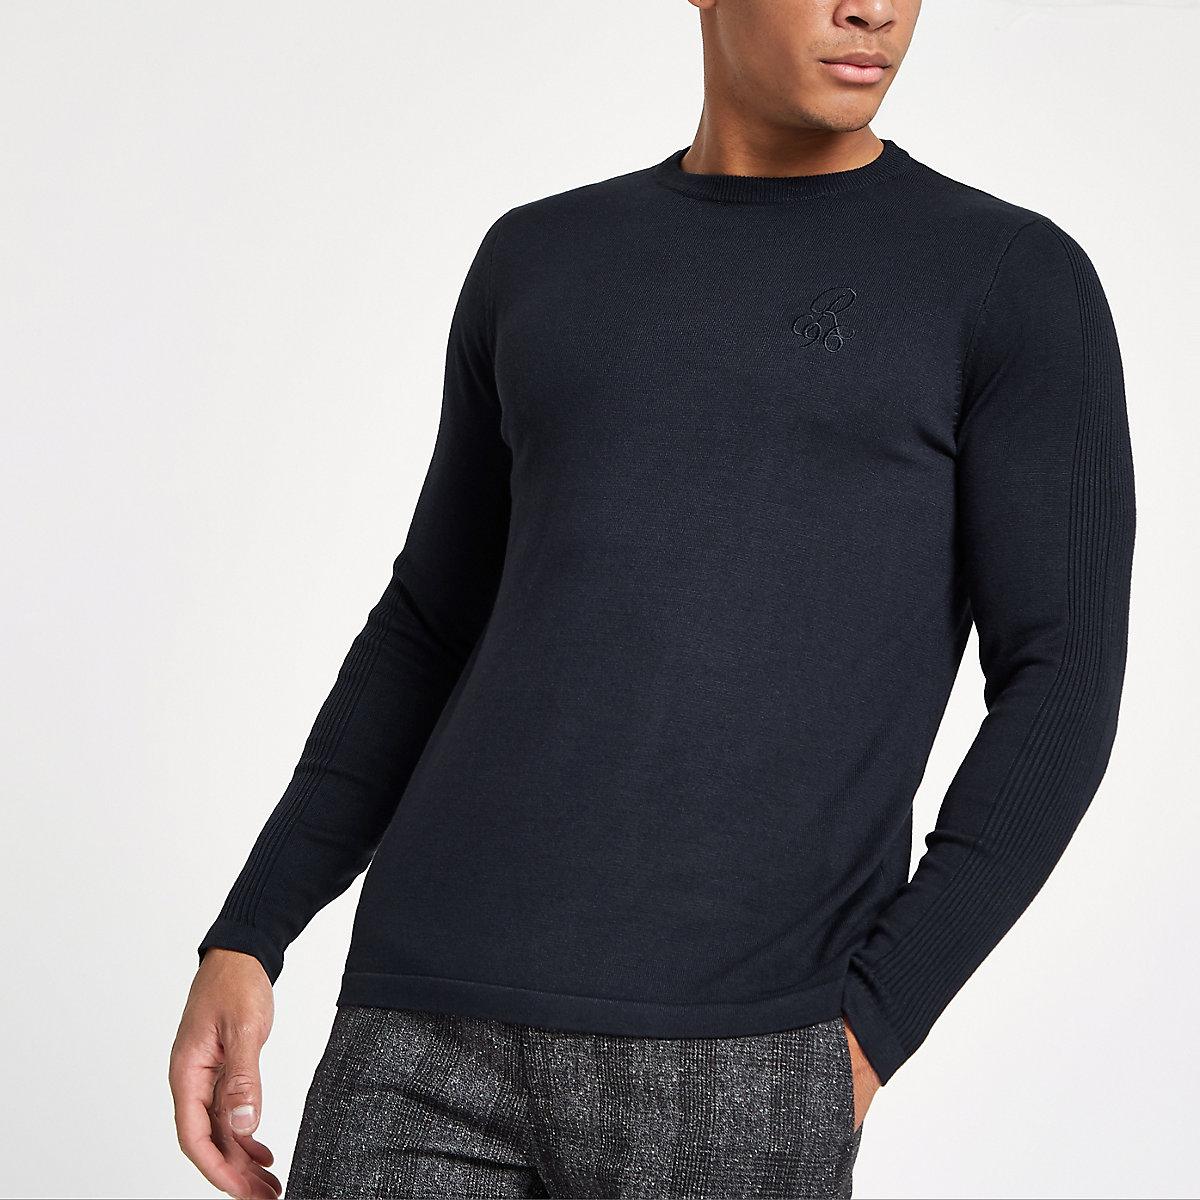 R96 navy slim fit crew neck jumper